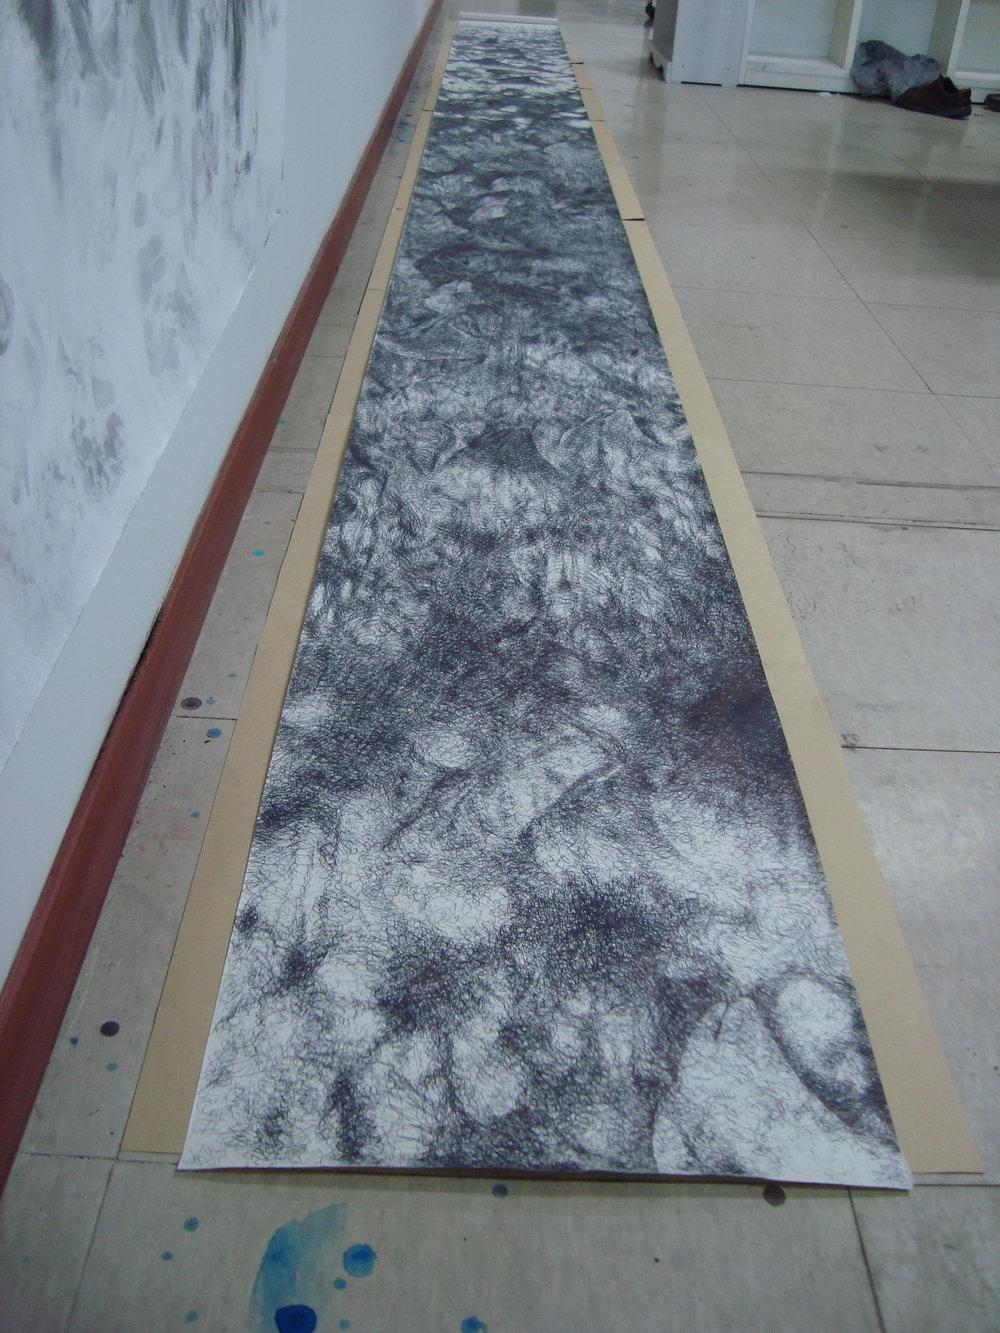 Bakhtyar Kaftan,  Intervention,  2018, pen on paper, 575 x 45 cm